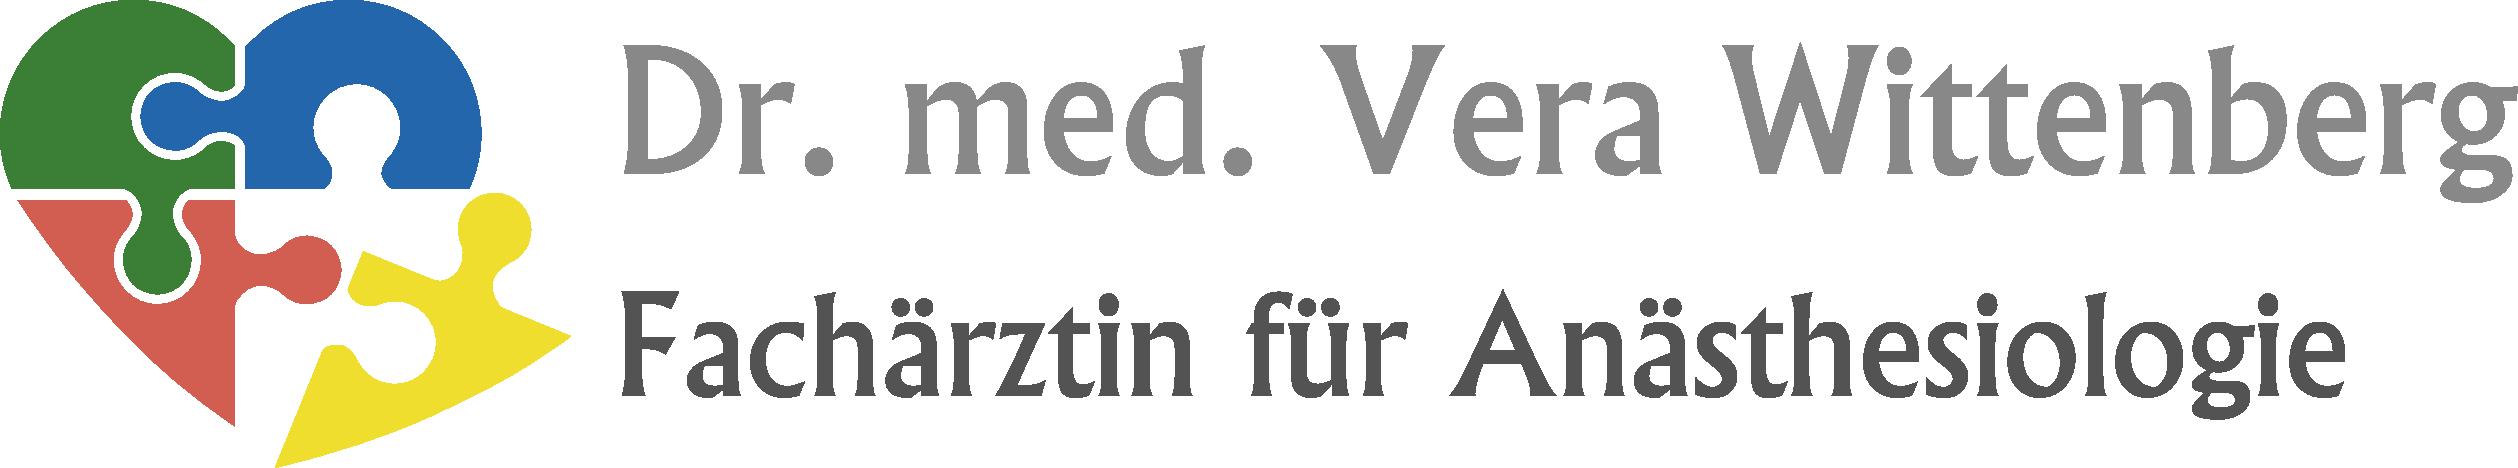 Dr. med. Vera Wittenberg